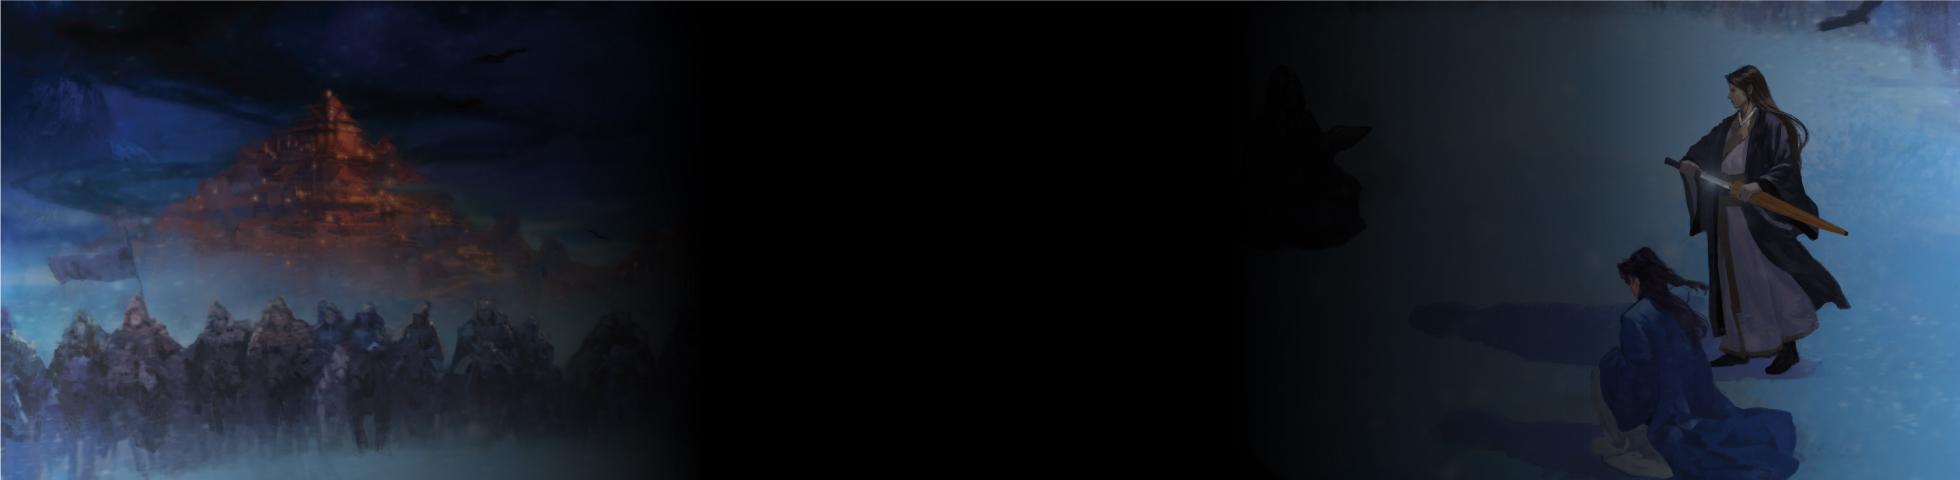 herobanner-ท้าลิขิต7-BG